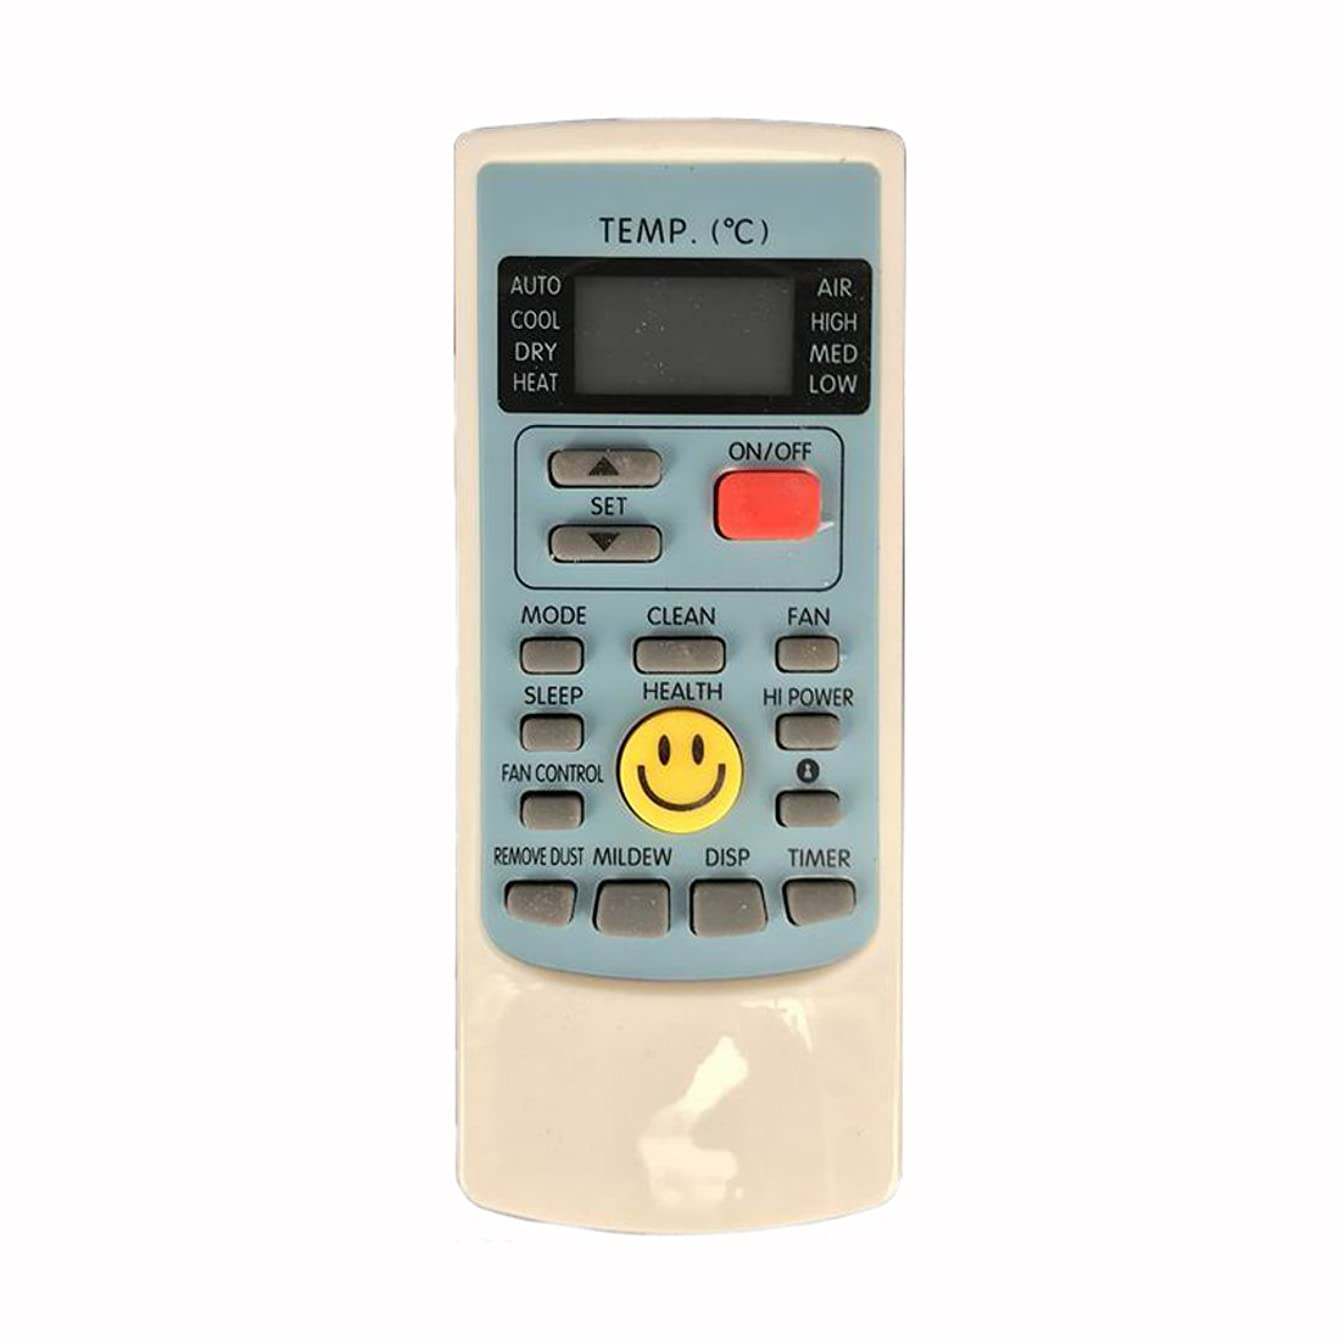 Meide AUX009 AUX Air Conditioning Remote Control for AUX YKR-H/008 YKR-H/009 YKR-H/012 YKR-H/209E Air Conditioner Remote Controller